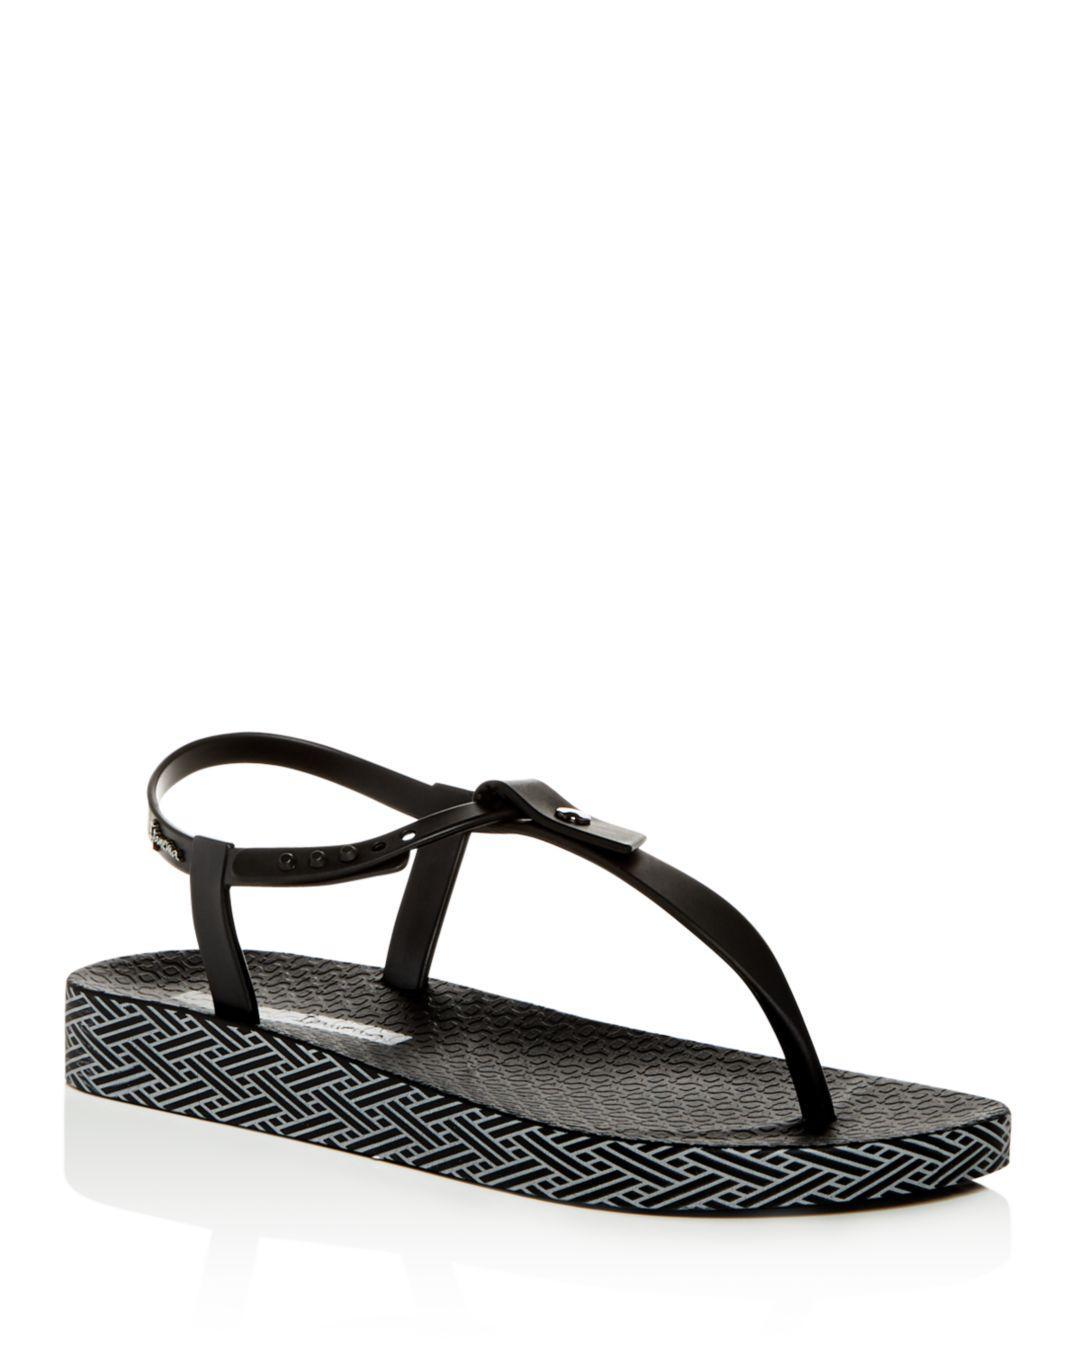 27067003d Lyst - Ipanema Women s Plushweave Wedge Thong Sandals in Black